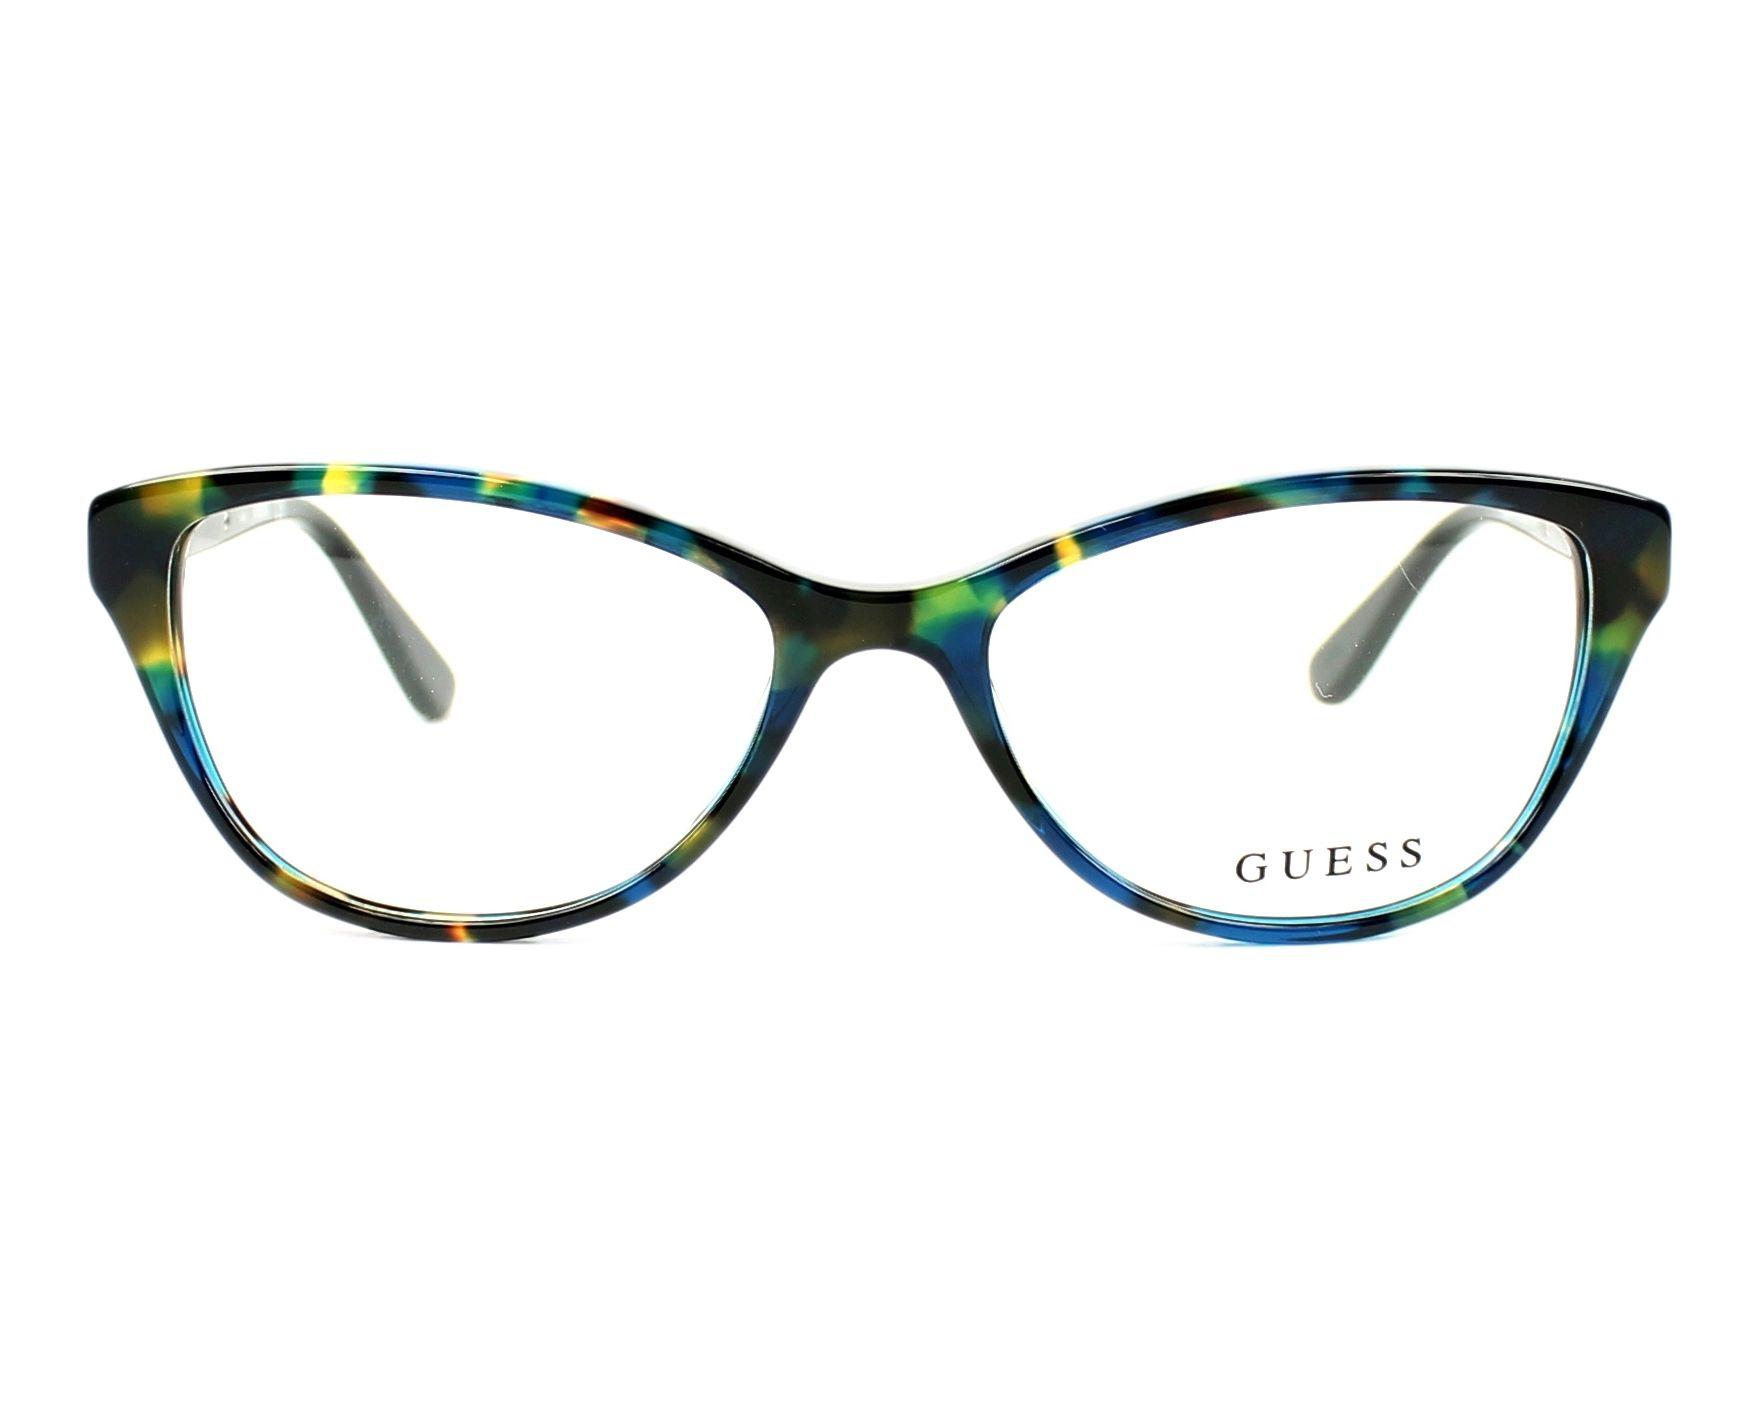 02c5c3bc9d eyeglasses Guess GU-2634 092 52-16 Blue Silver front view